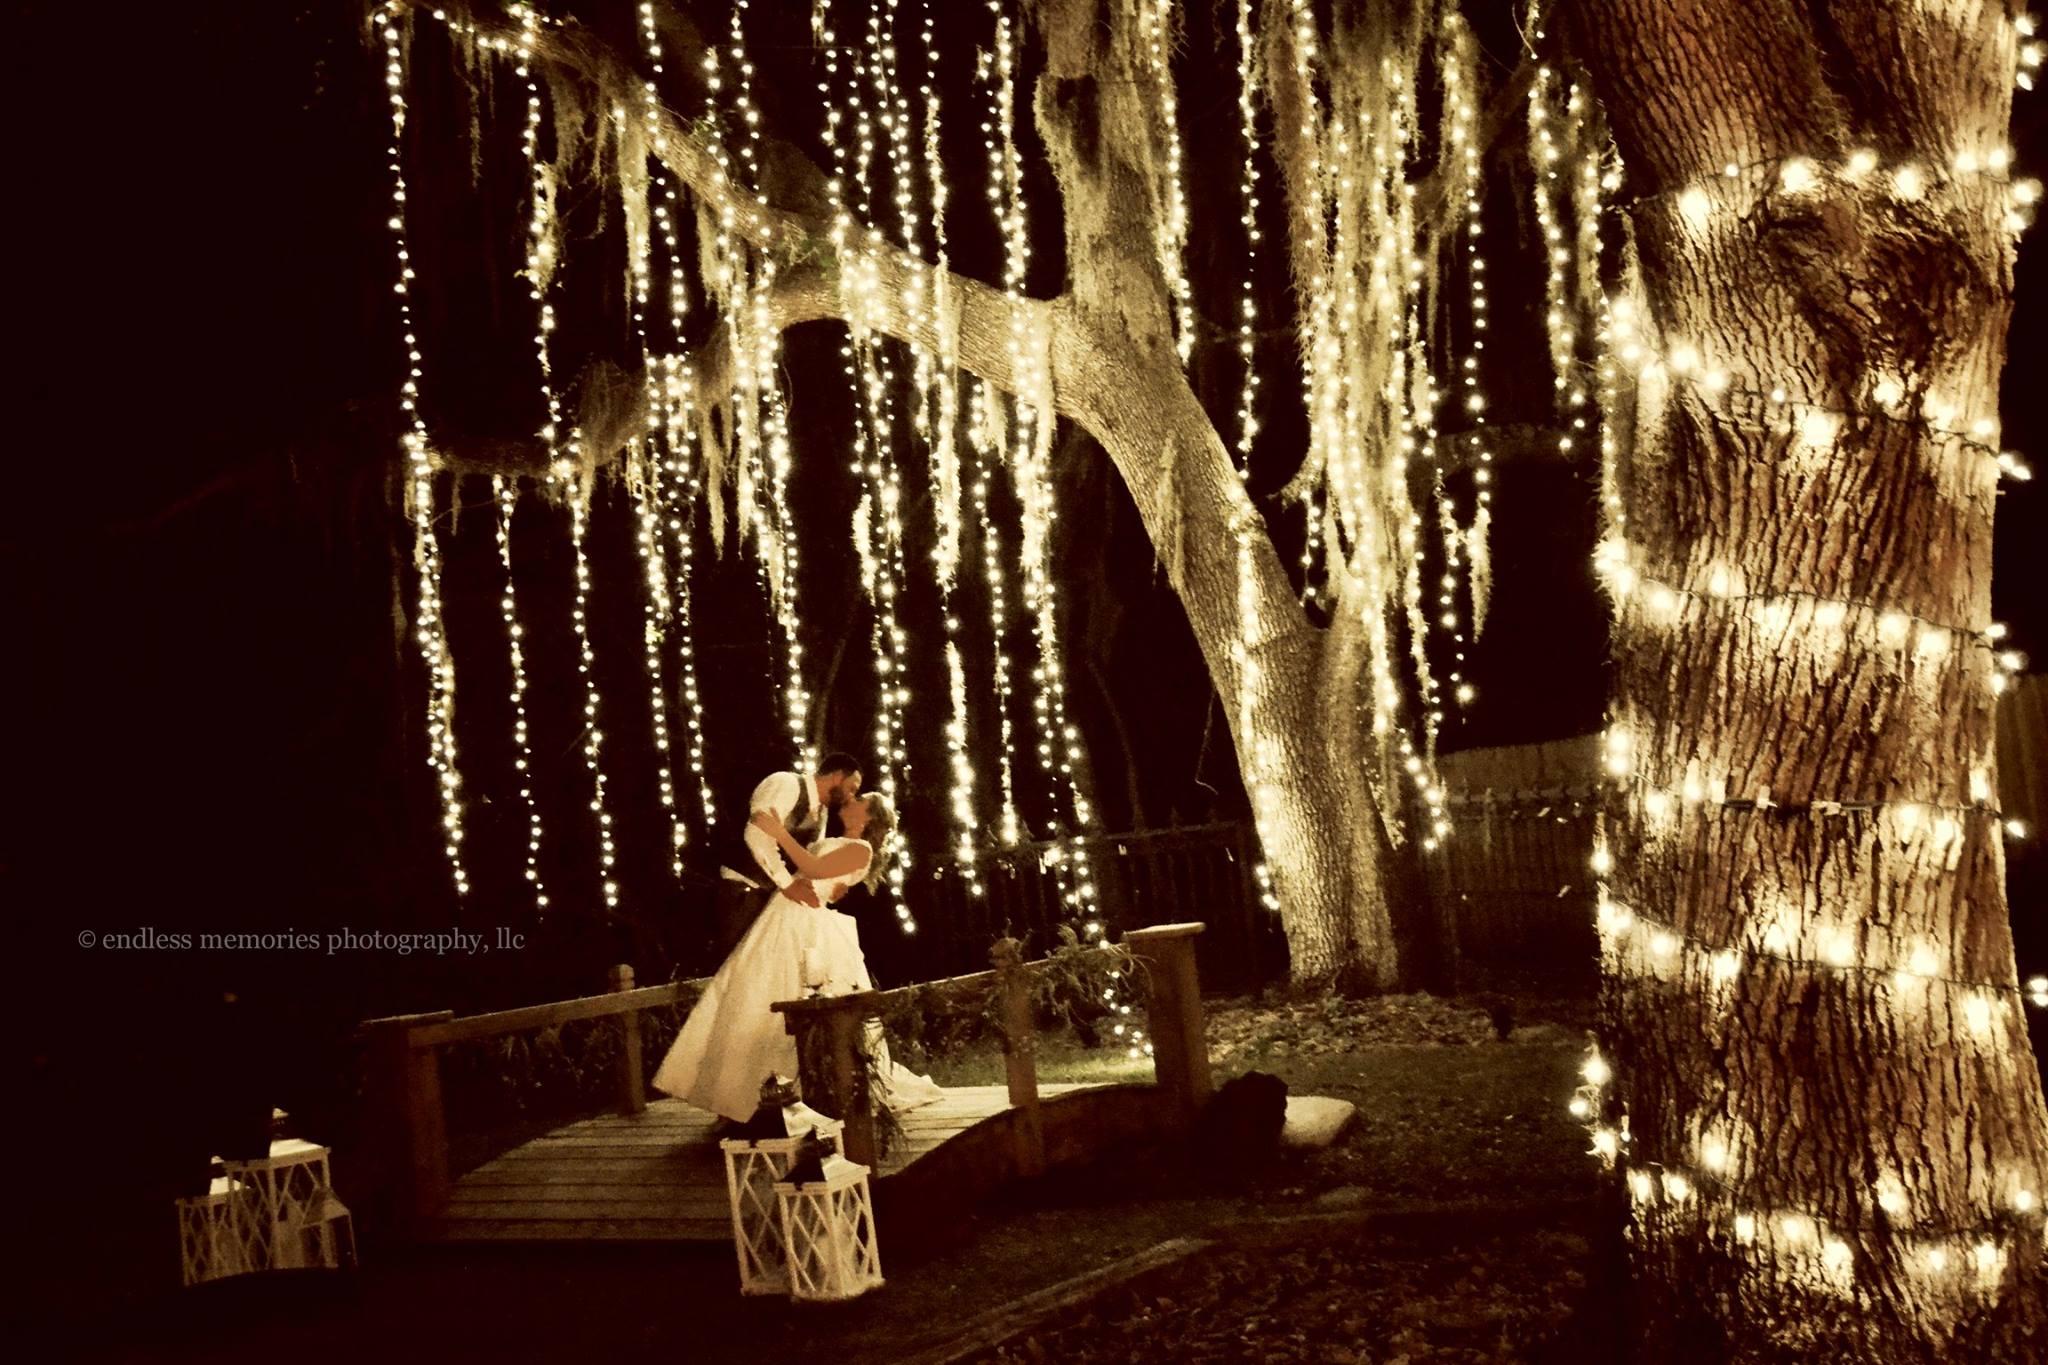 Bakers Ranch - wedding venue - Love lock bridge (2).jpg